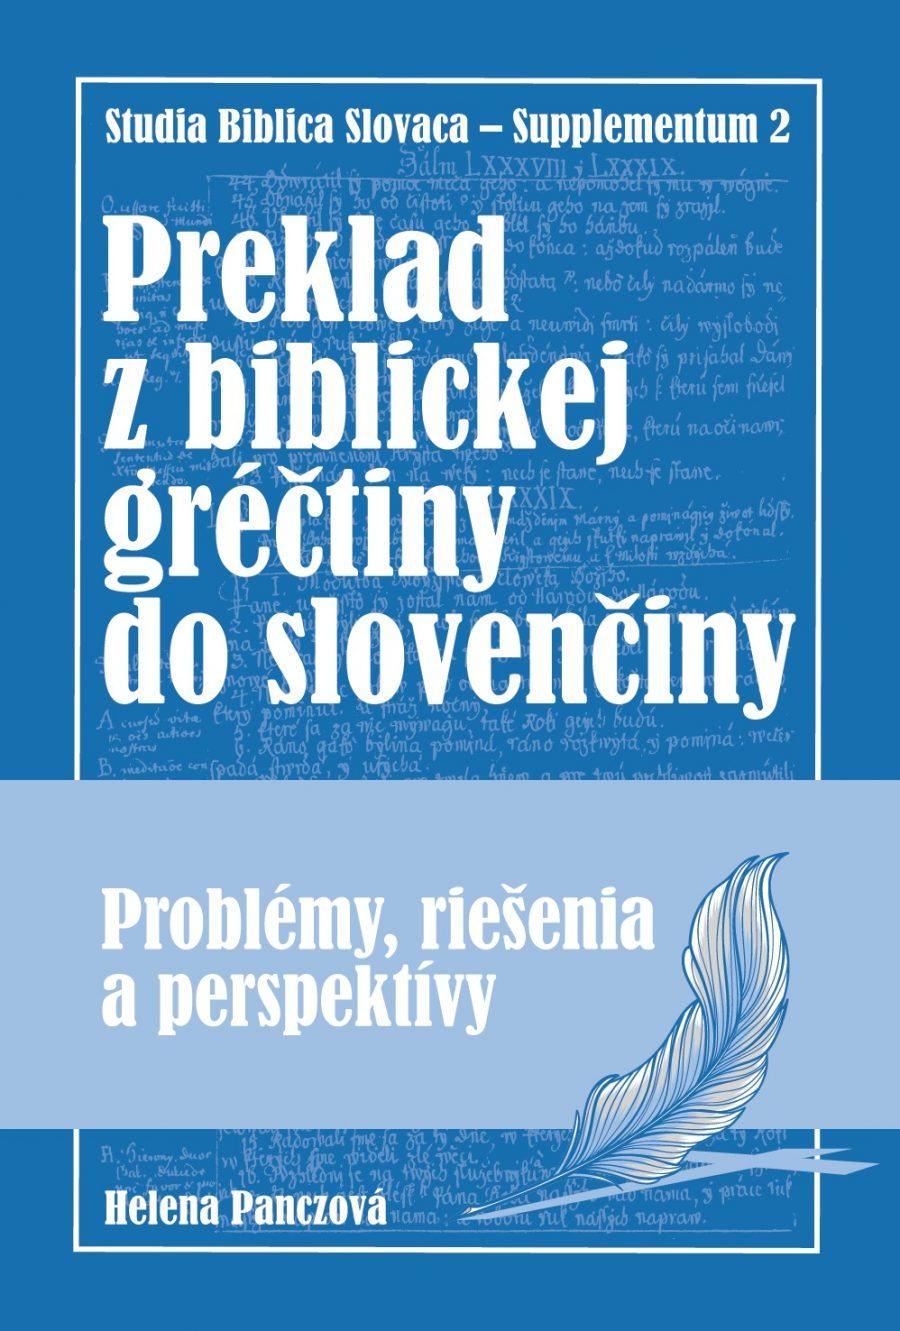 Panczová, Predklad z biblickej gréčtiny do slovenčiny